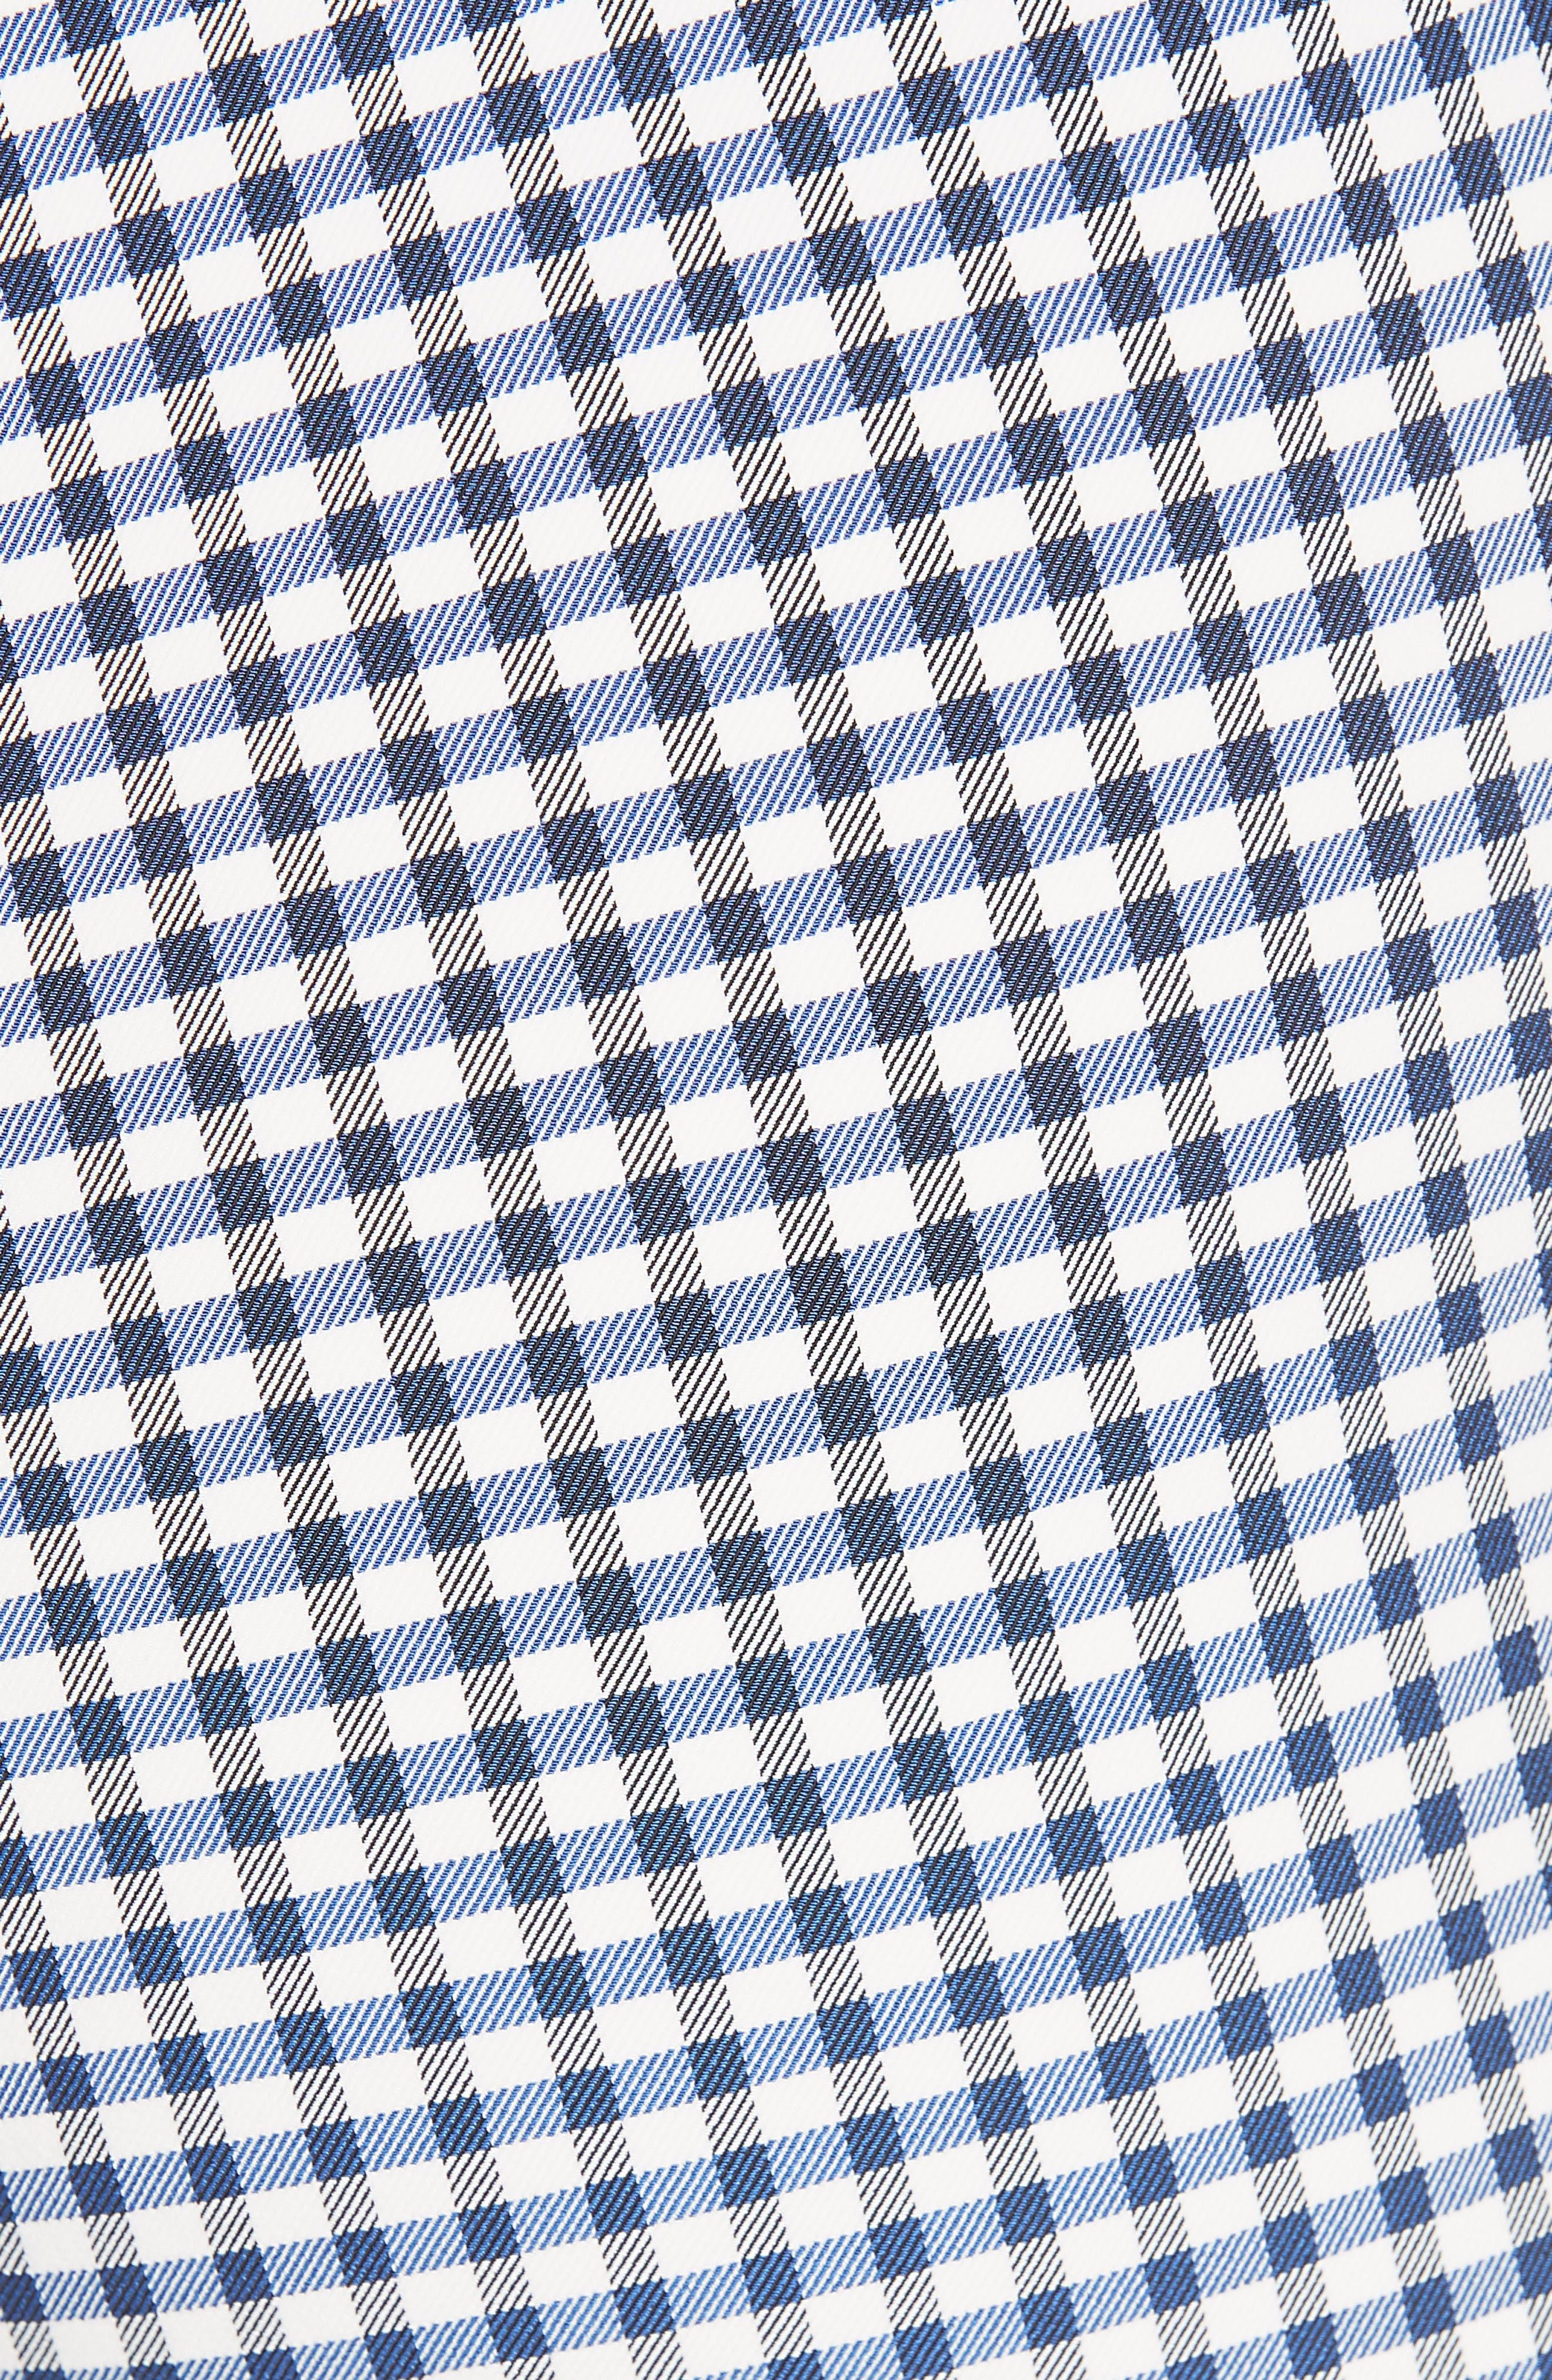 Gingham Check Skinny Pants,                             Alternate thumbnail 5, color,                             BLUE MULTI